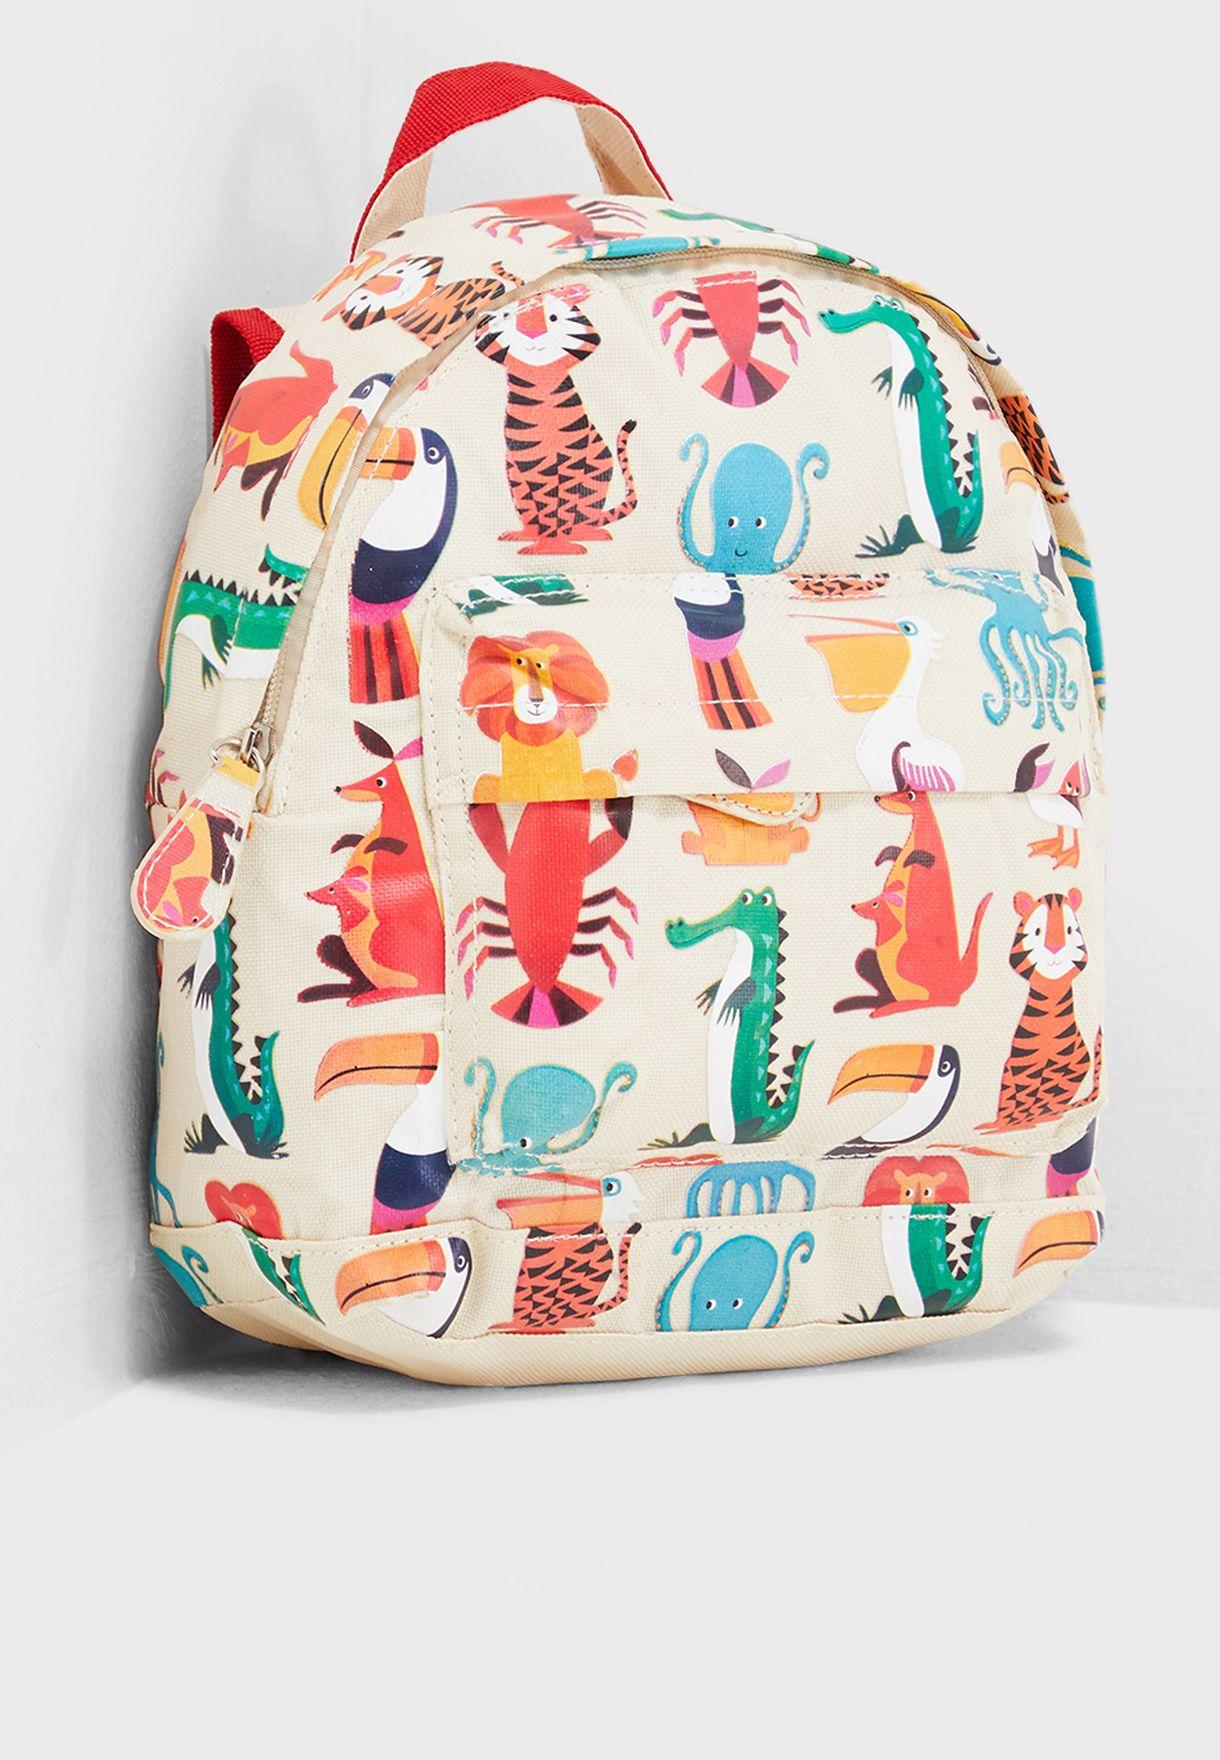 Shop Rex London prints Kids Colorful Creatures Mini Backpack 26550 for Kids  in Qatar - 26616AC45TVP 06e67e72f3c85